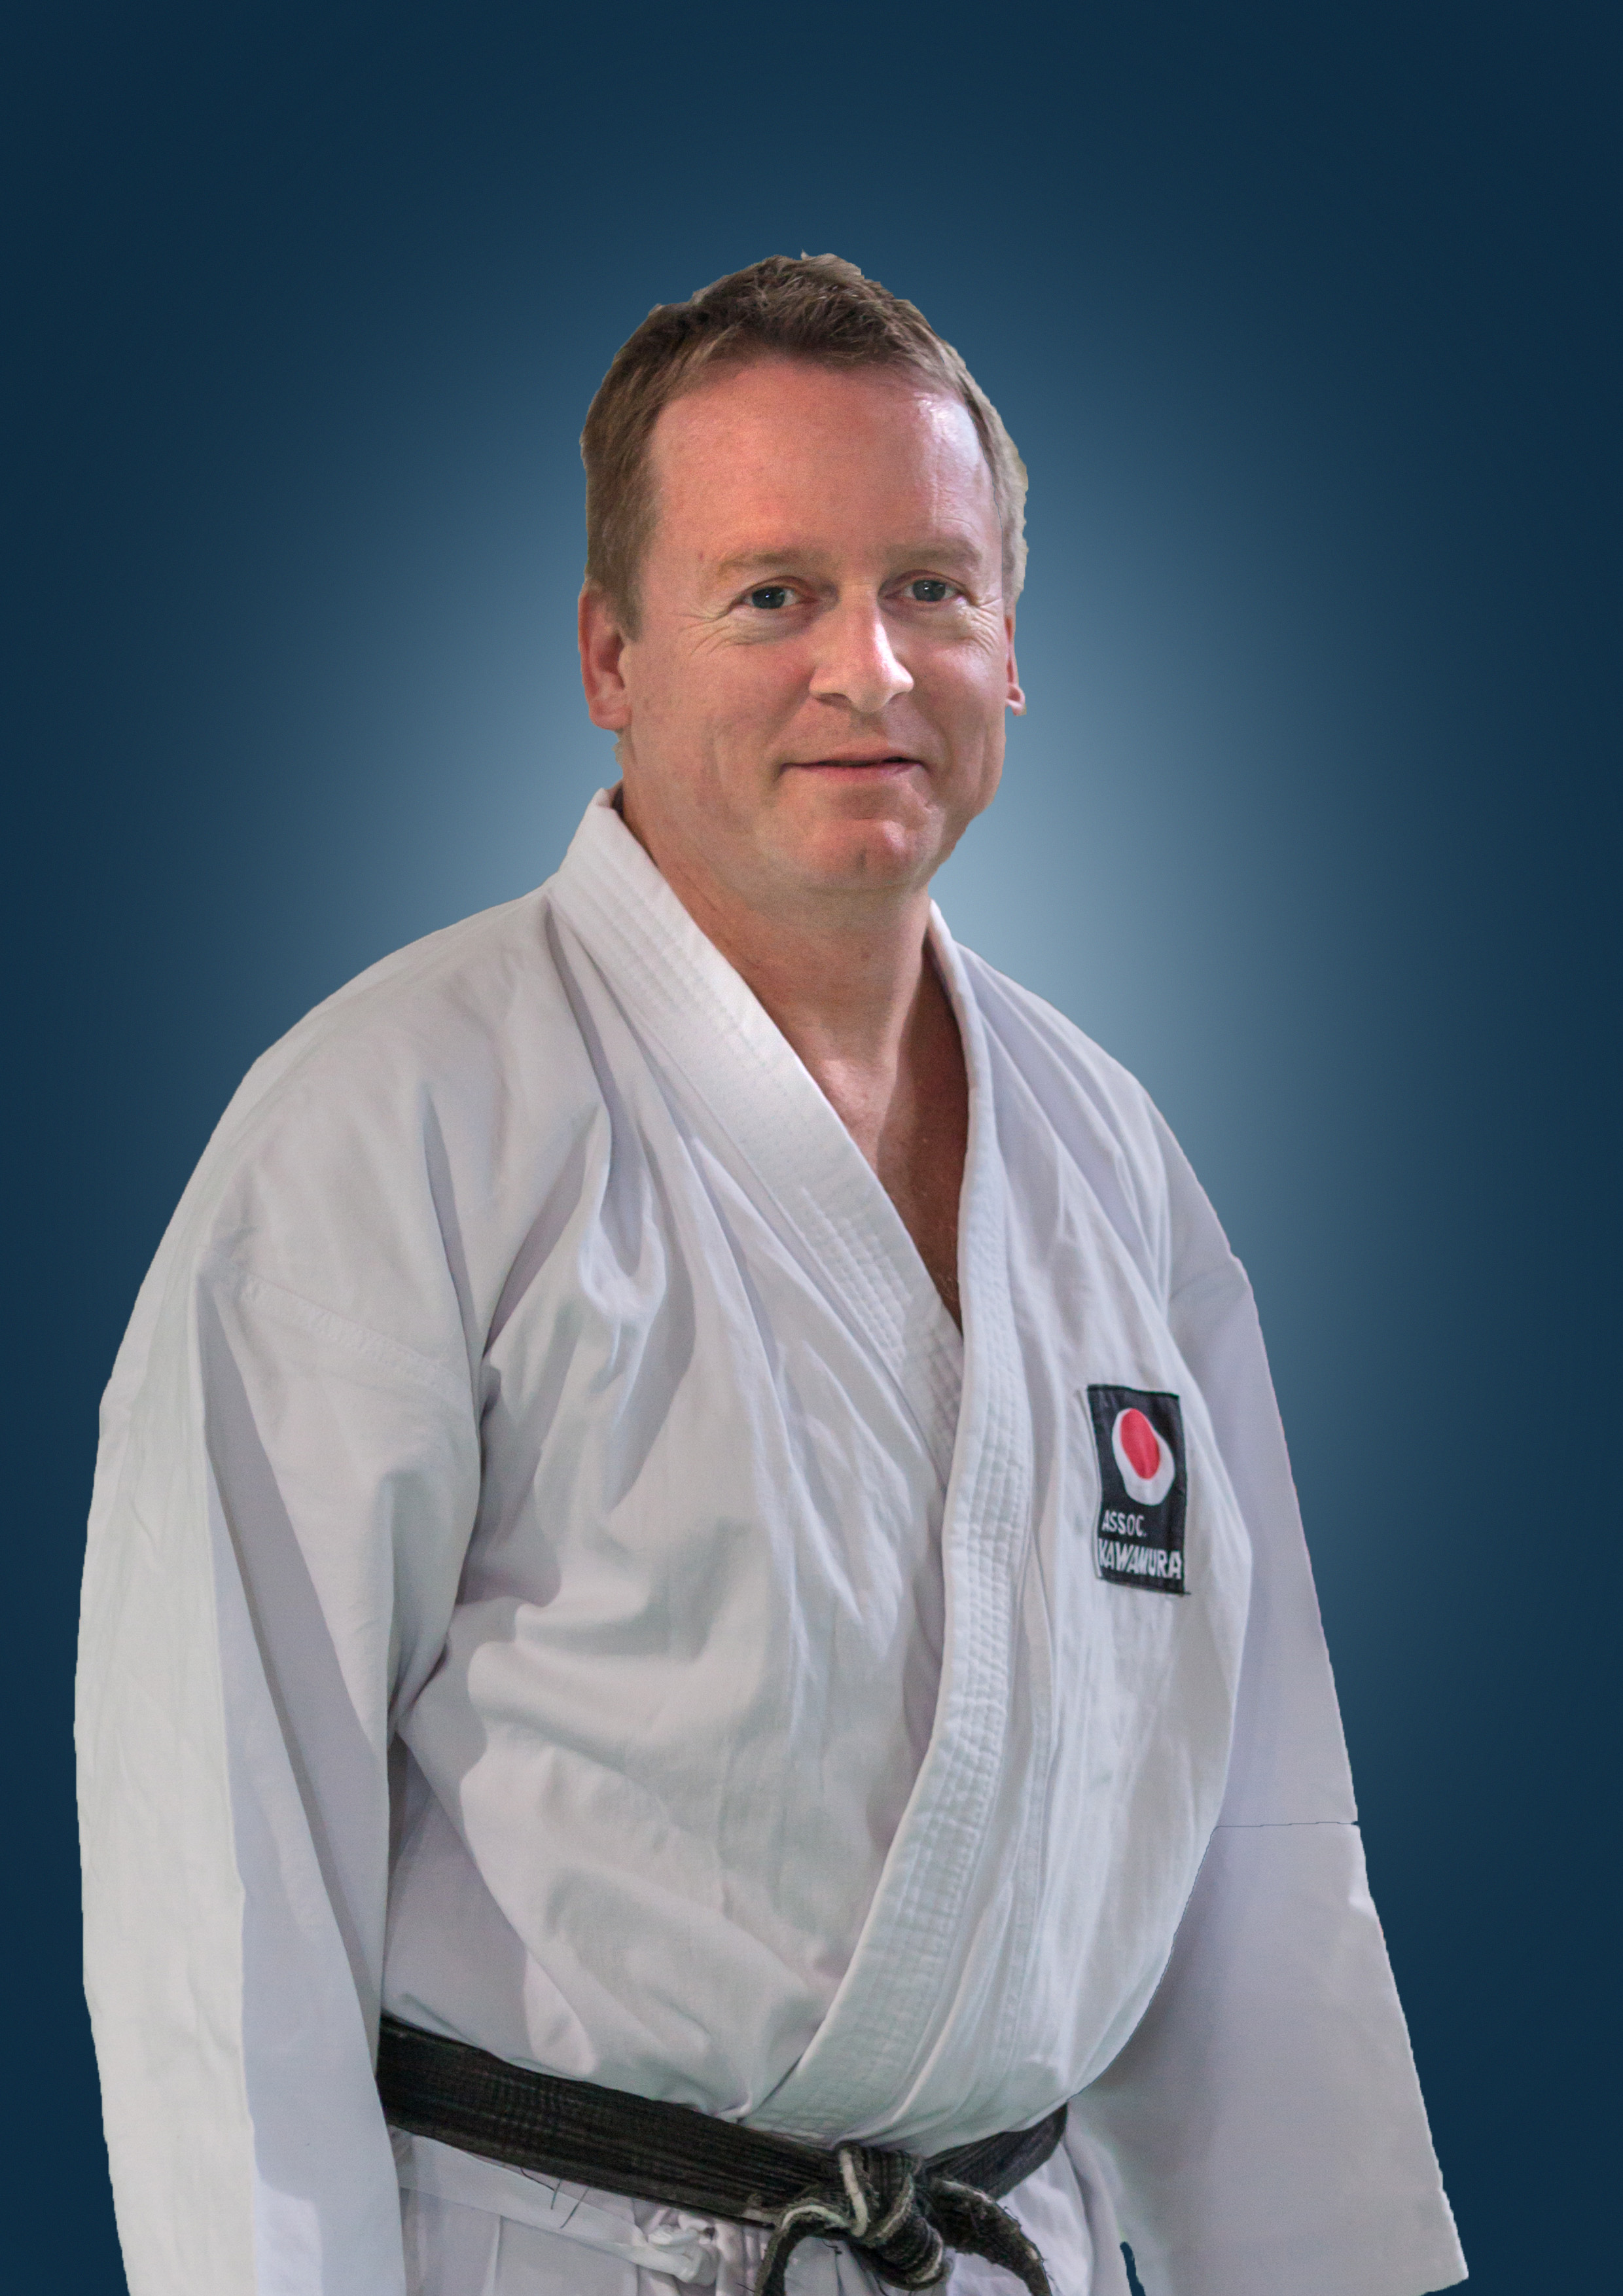 Dr. Dietmar Wagner